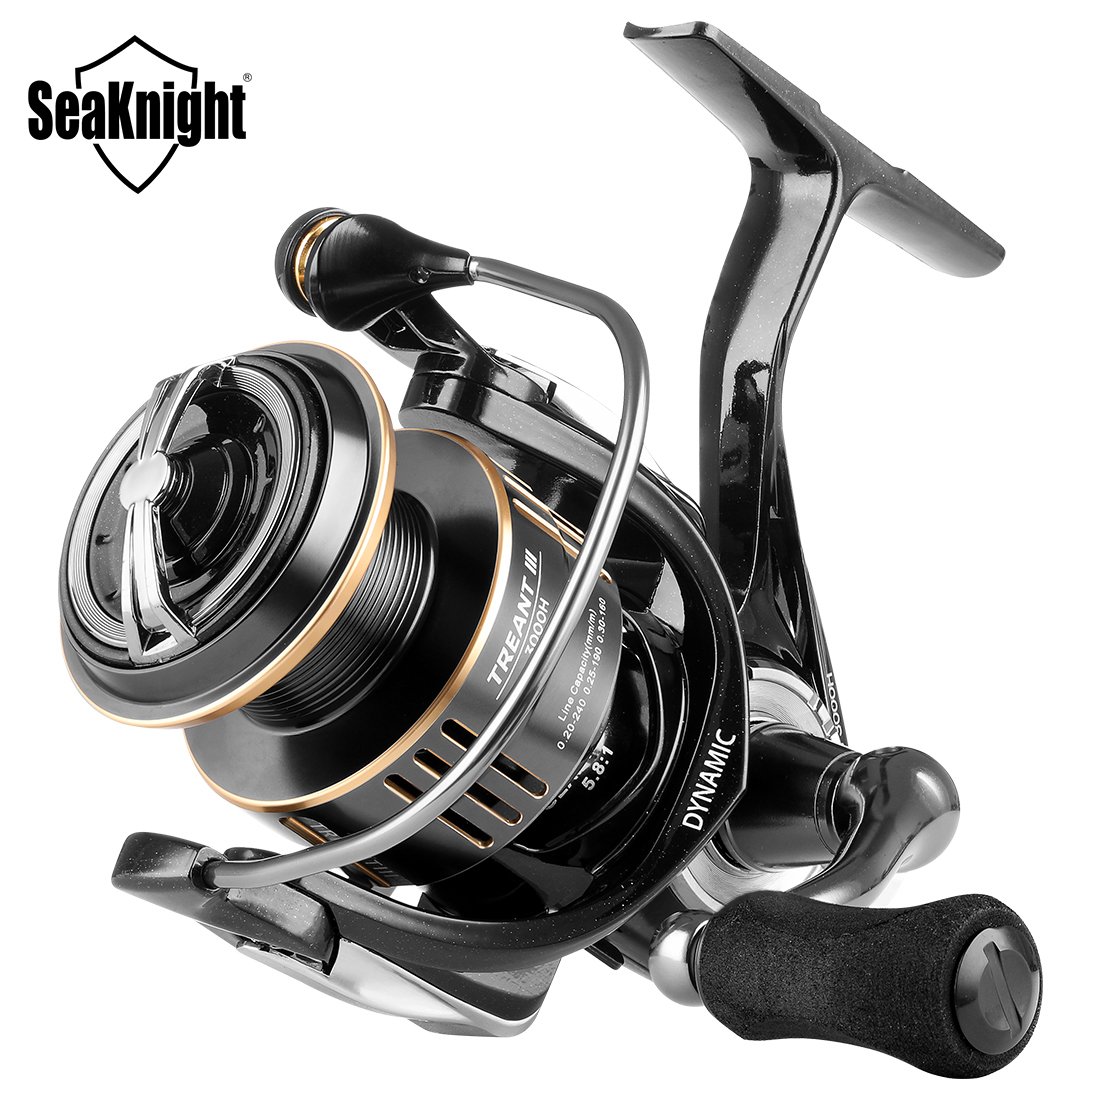 SeaKnight Brand TREANT III Series 1